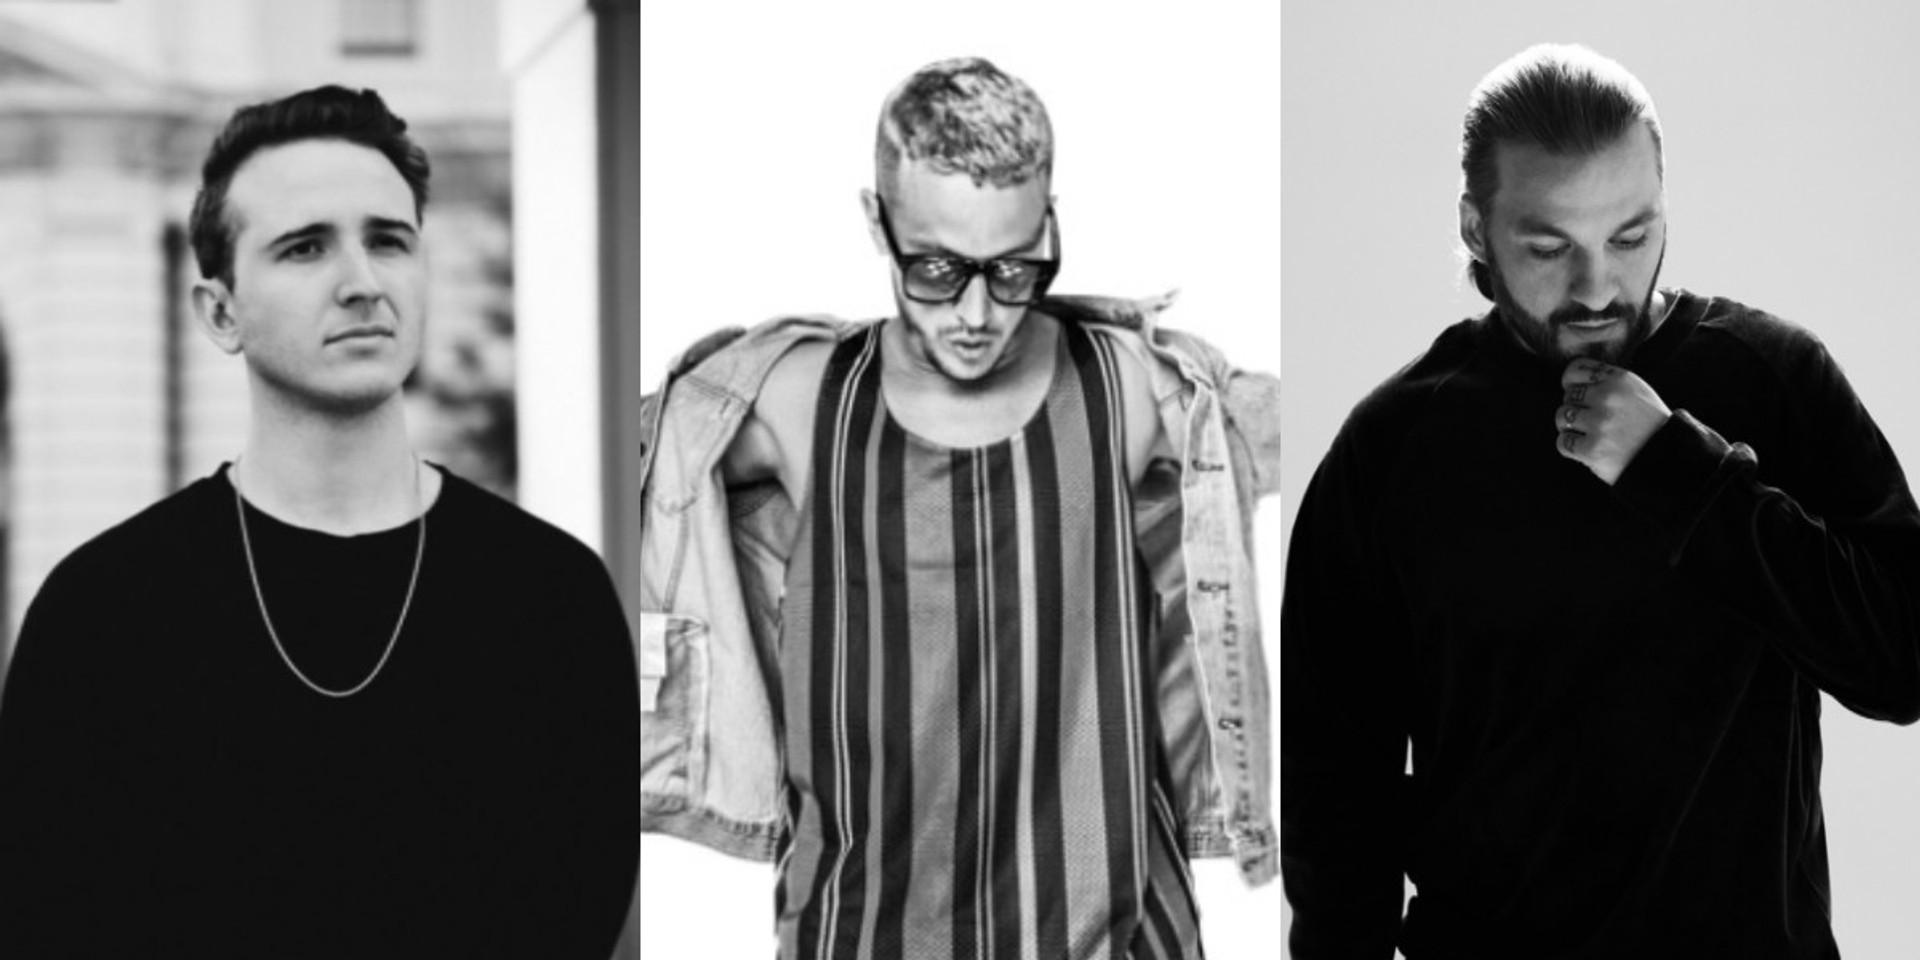 Ultra Singapore finally reveals line-up for 2018 festival – DJ SNAKE, RL Grime, Steve Angello and more